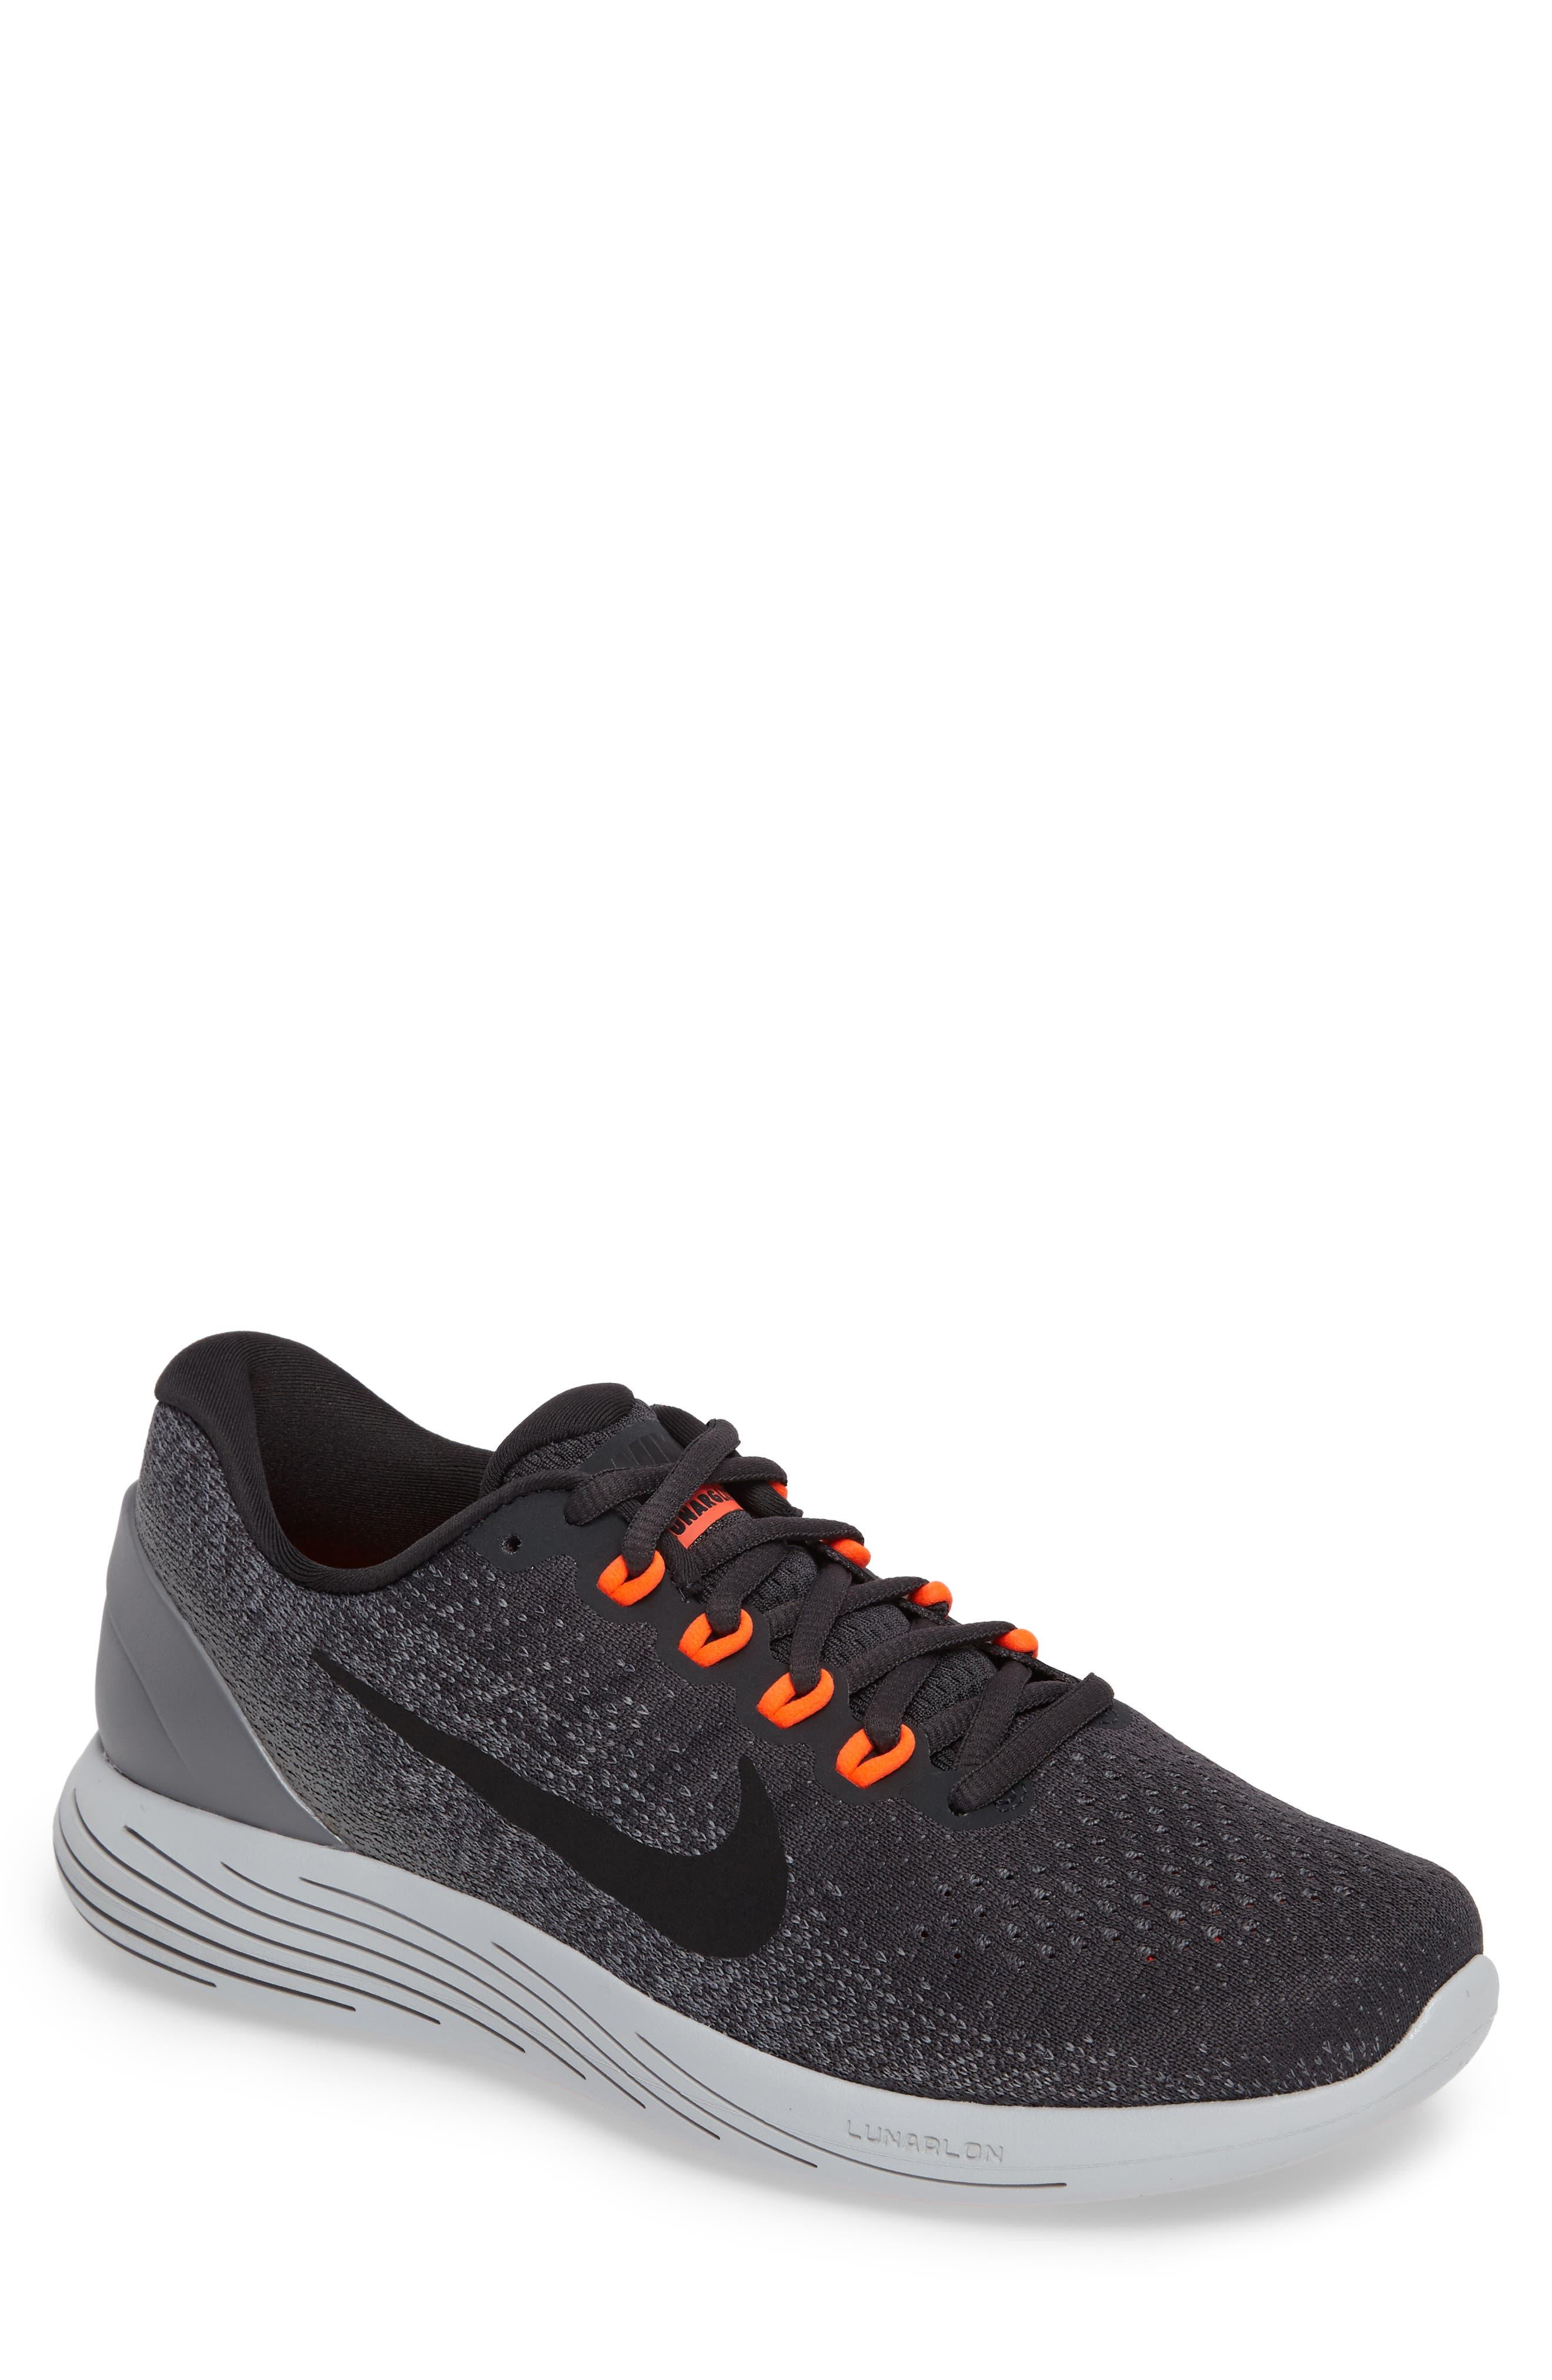 NIKE LunarGlide 9 Running Shoe